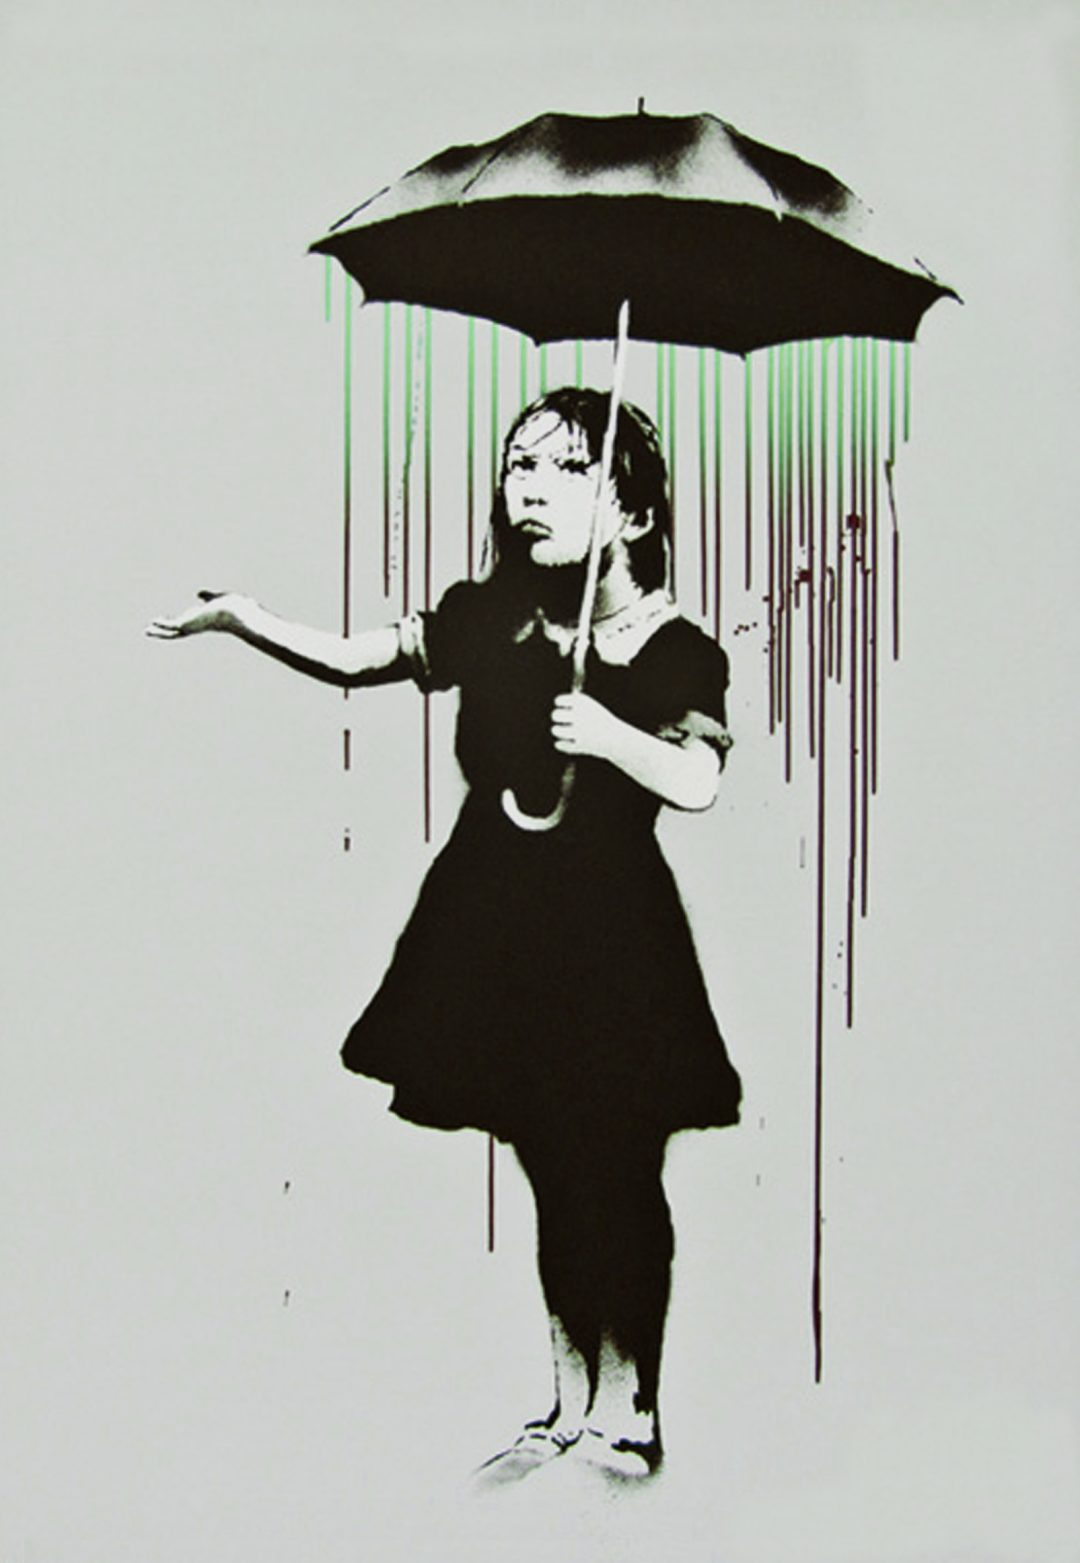 Nola (Green/Burgundy) by Banksy